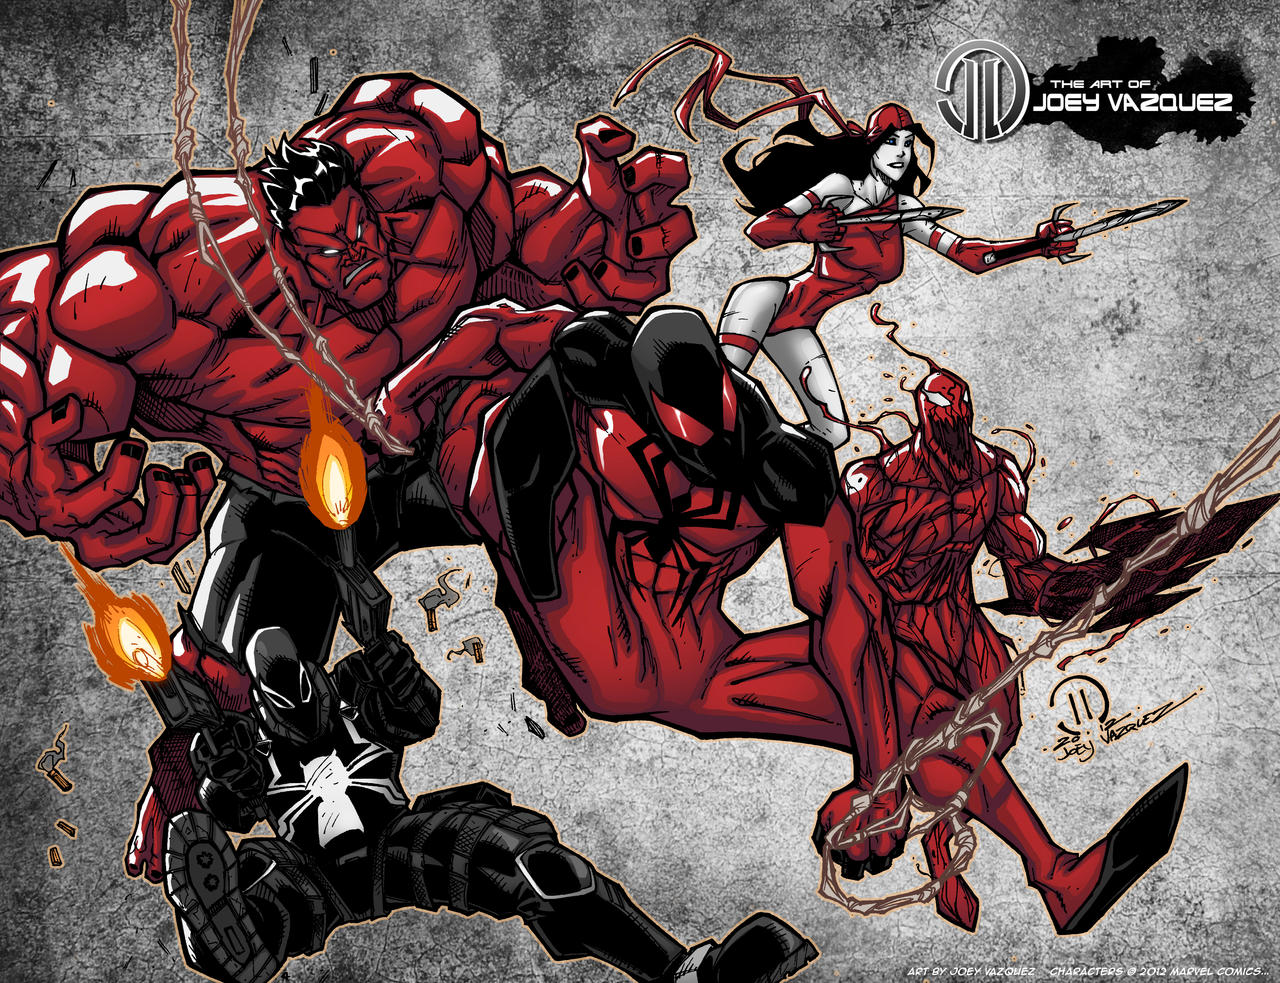 Red VENGEANCE Print by JoeyVazquez